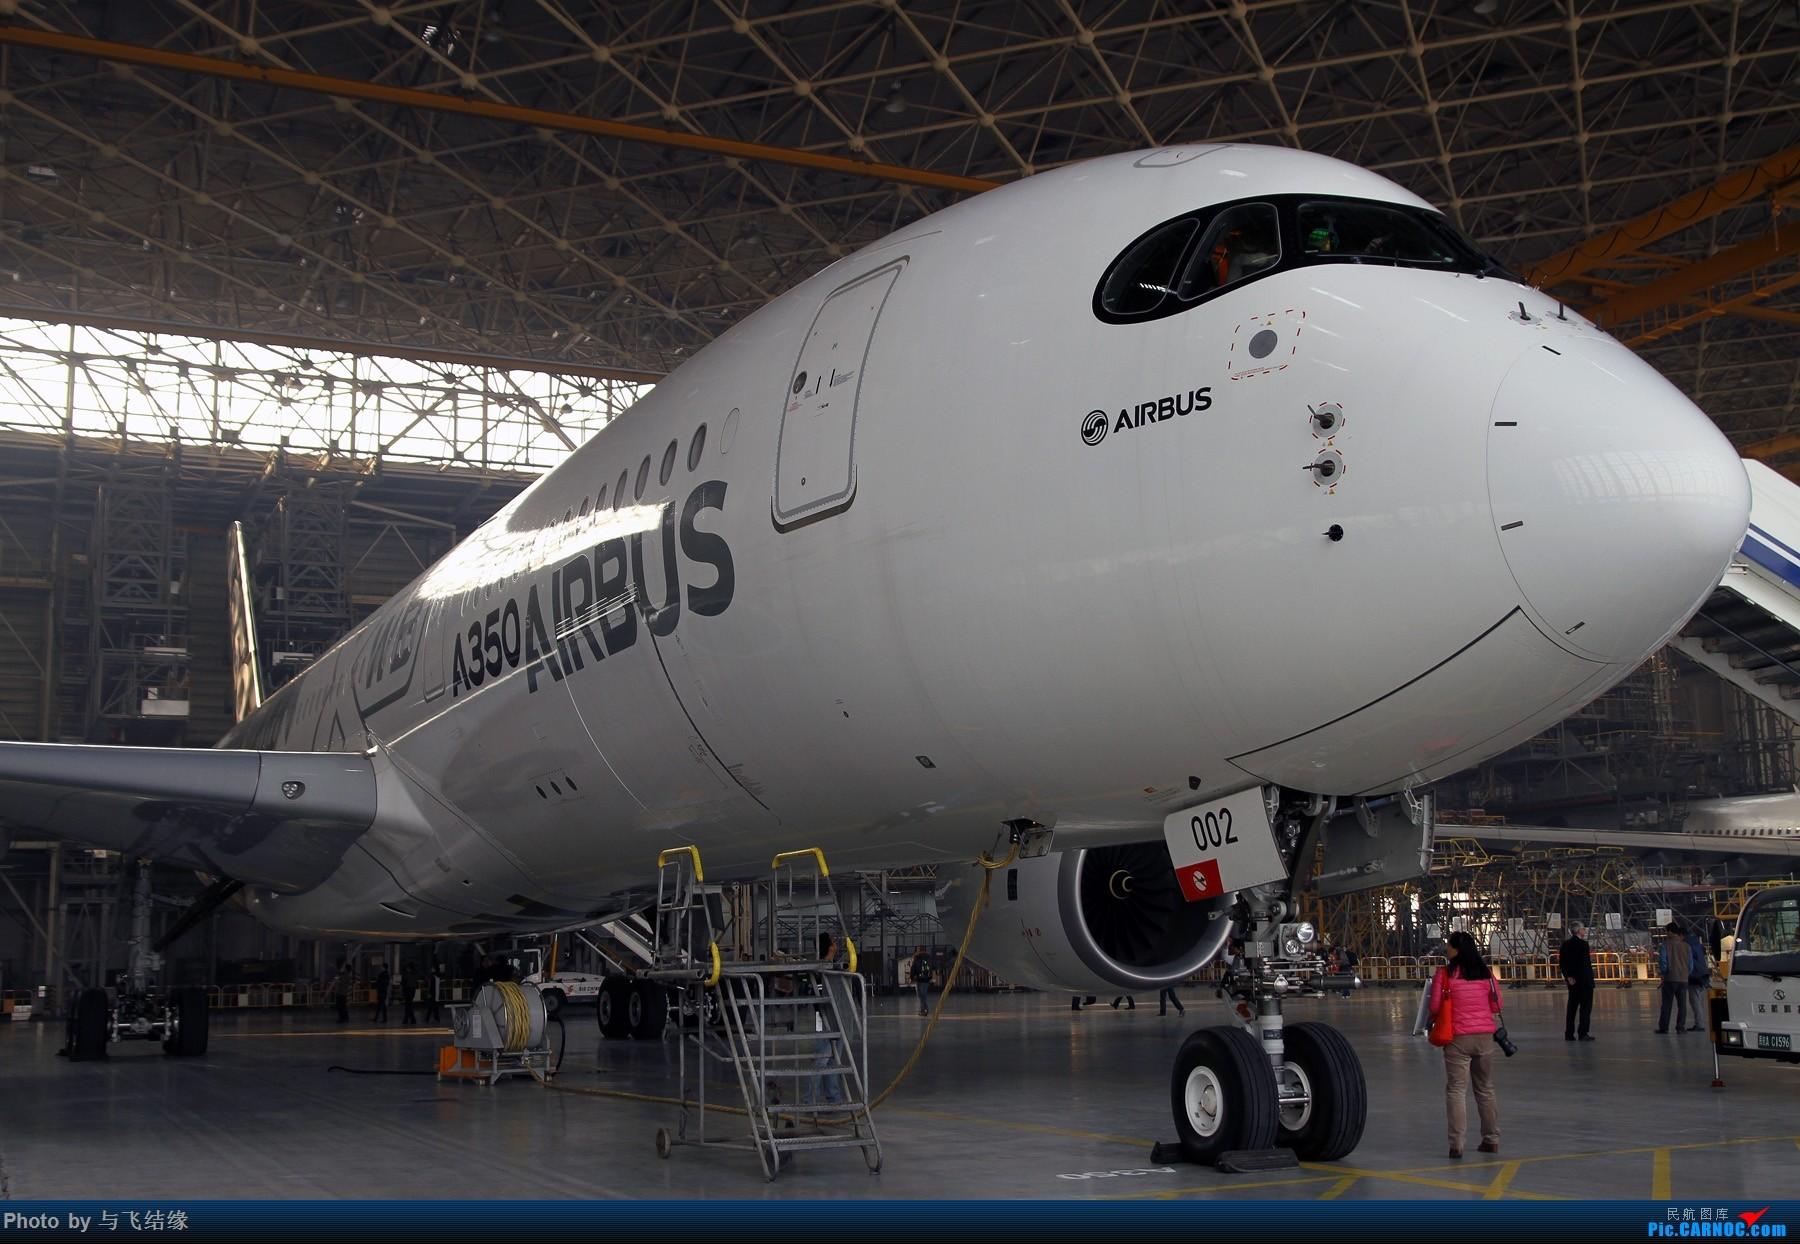 Re:[原创]在PEK的Airbus A350-900(部分) AIRBUS A350-900 F-WWCF 中国北京首都国际机场